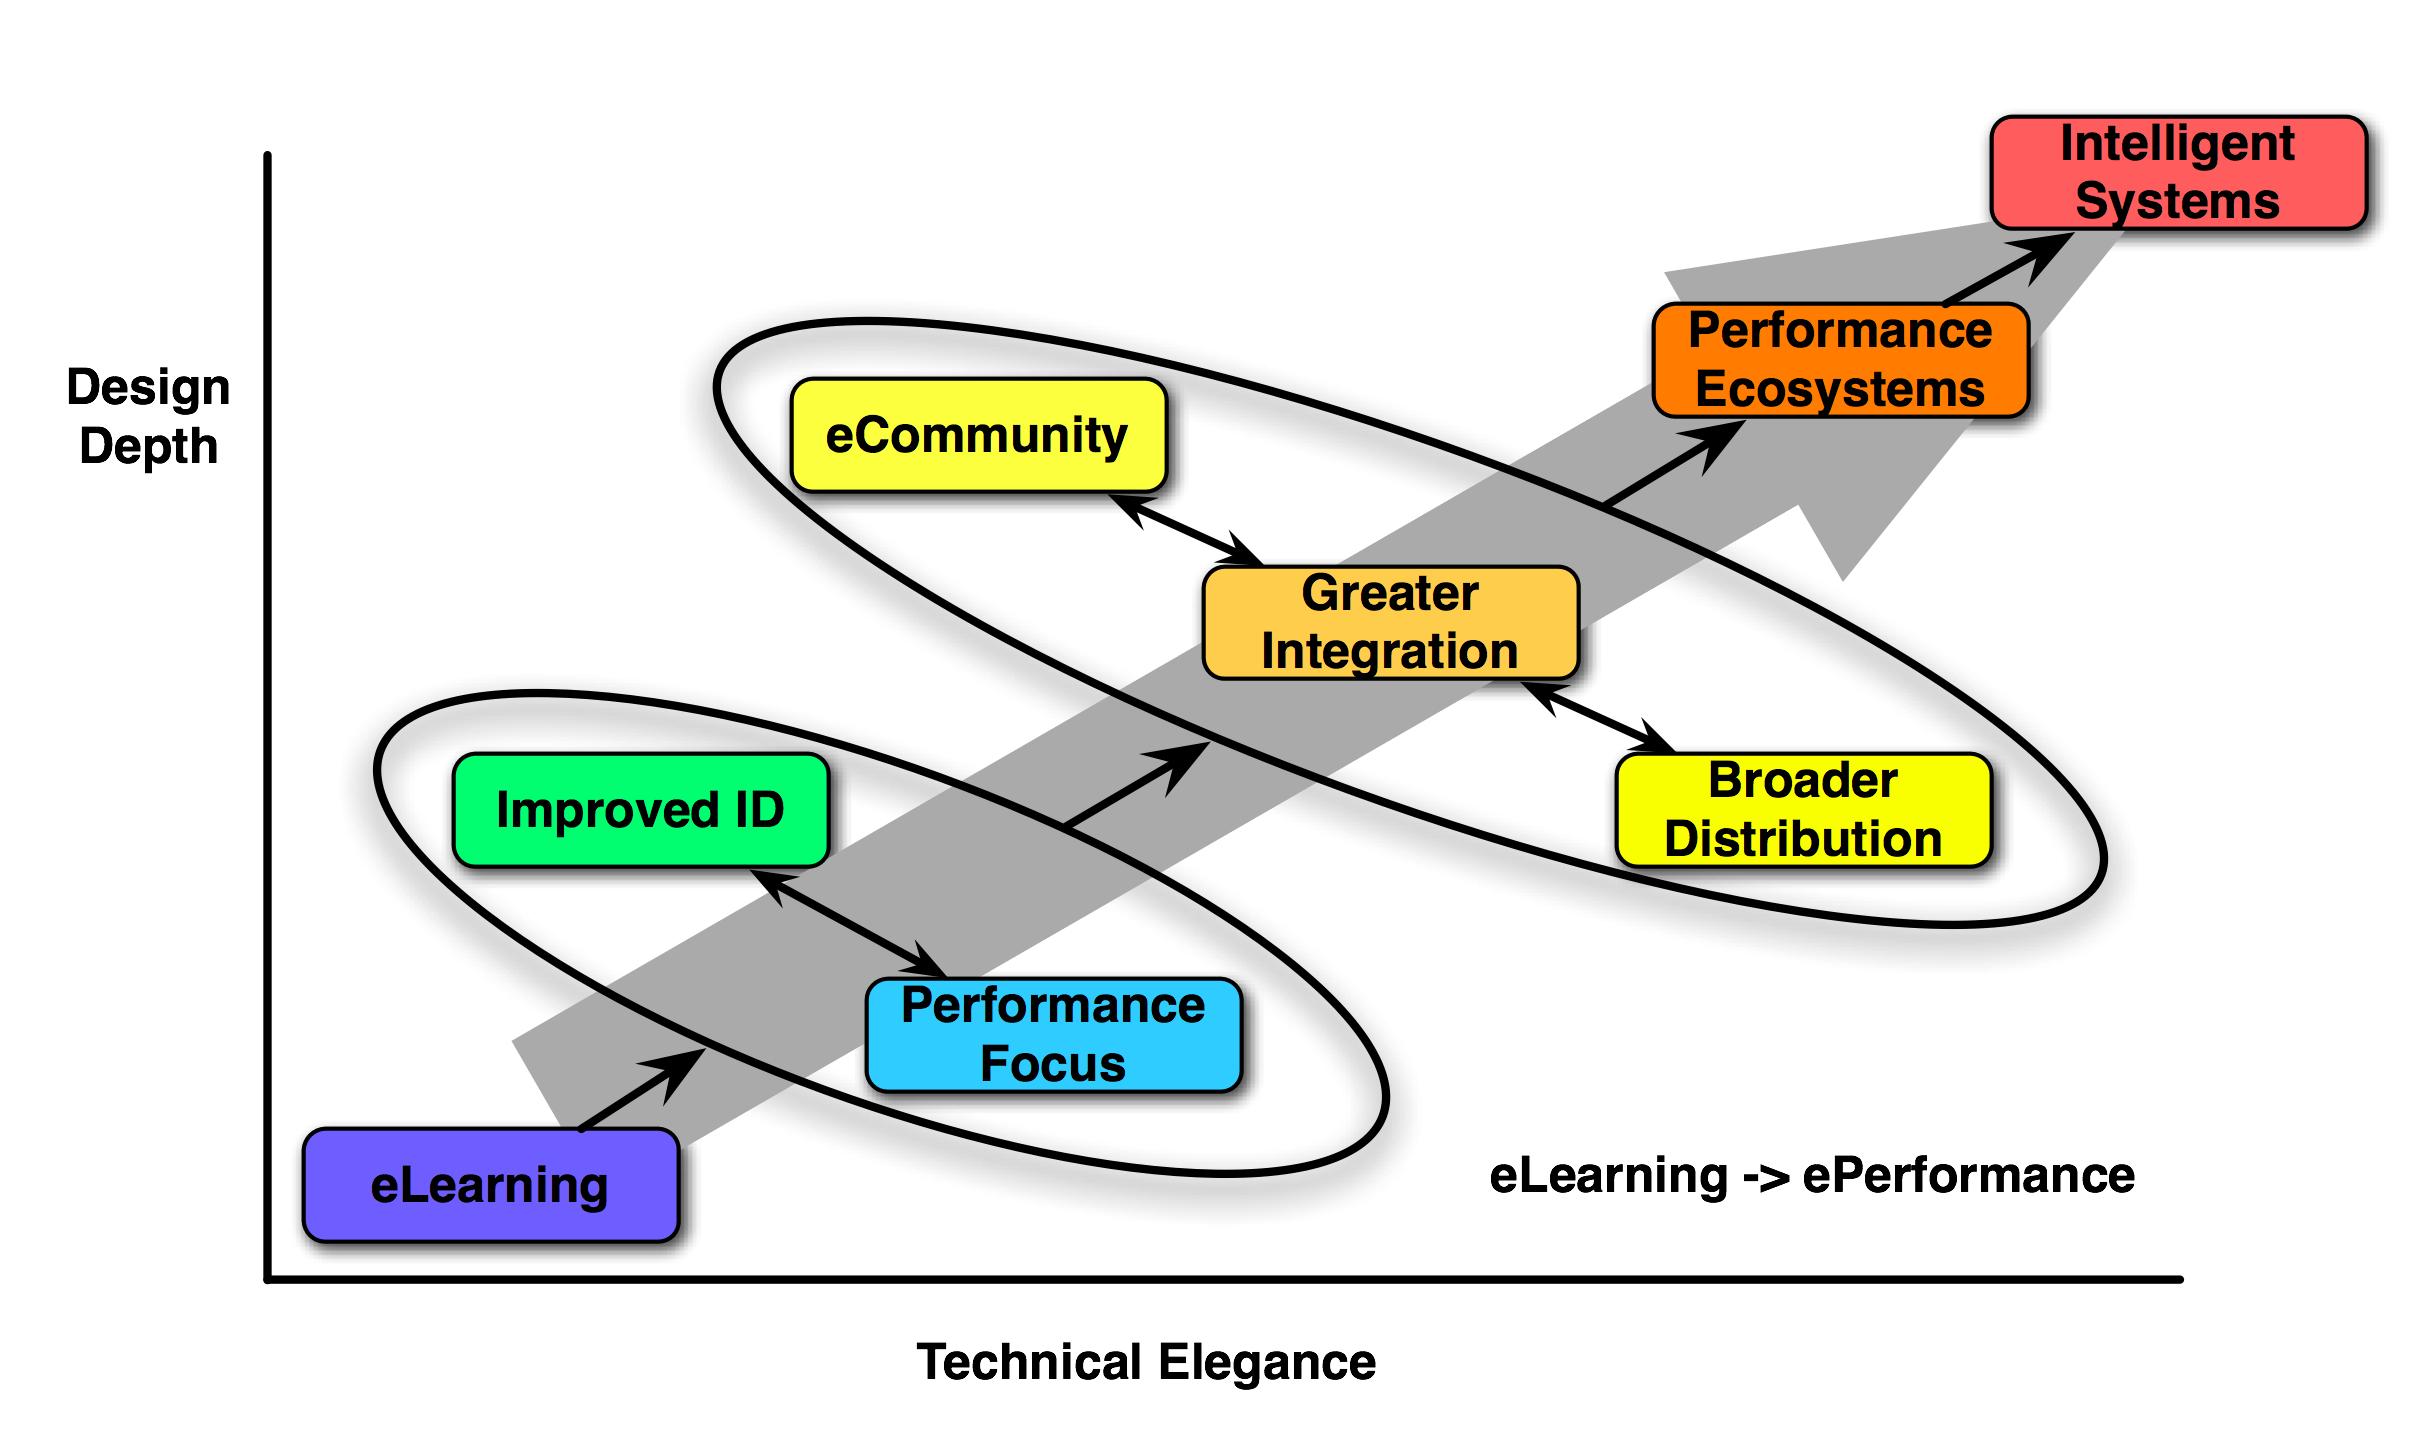 Performance Ecosystem